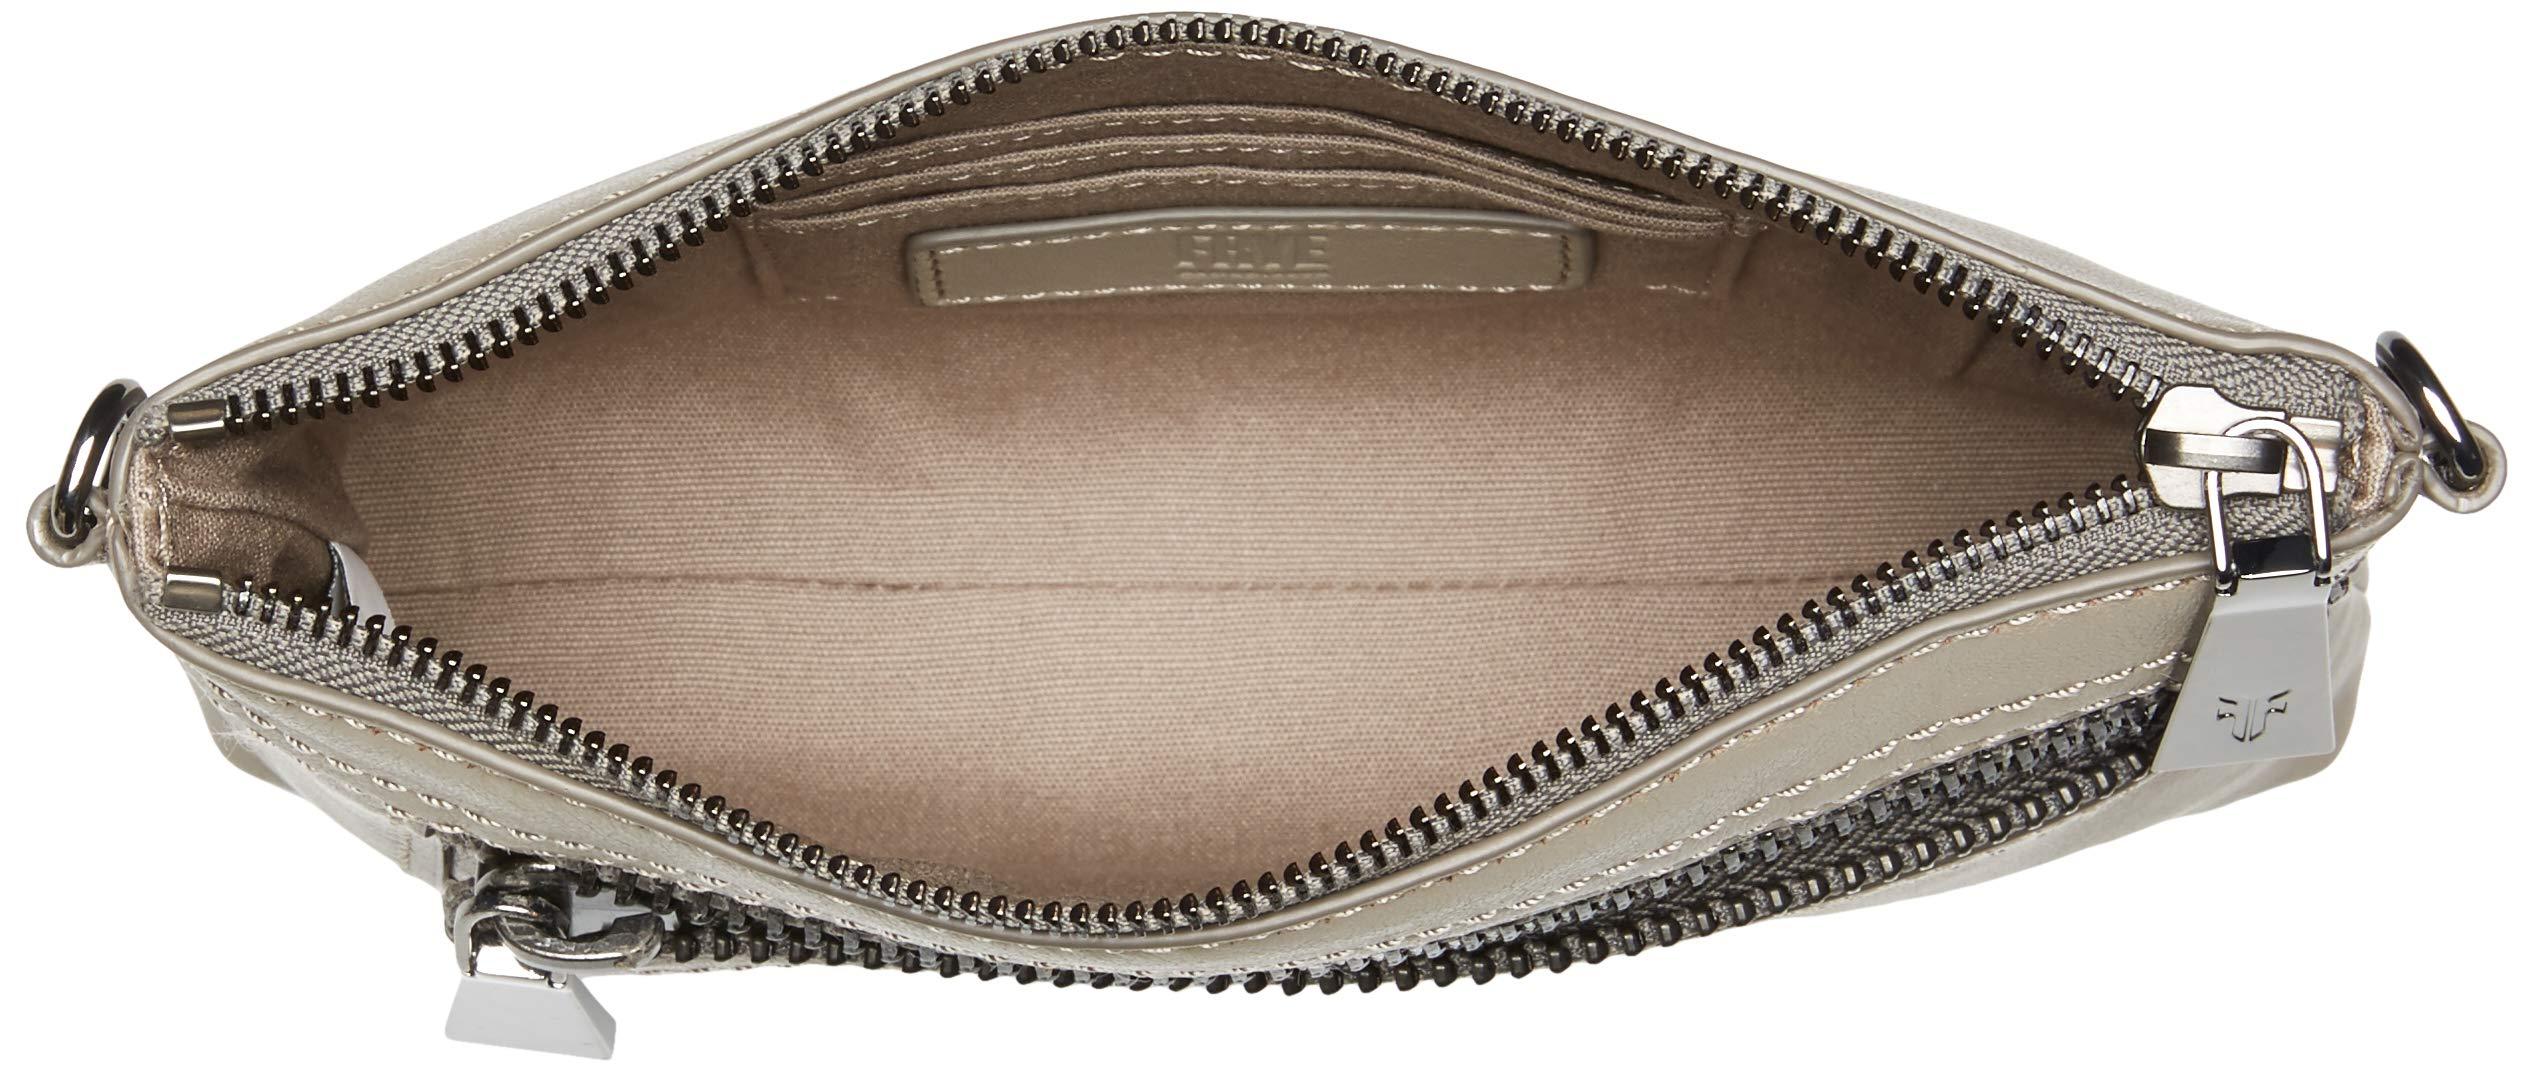 FRYE Lena Zip Leather Crossbody Wristlet Bag, grey by FRYE (Image #5)